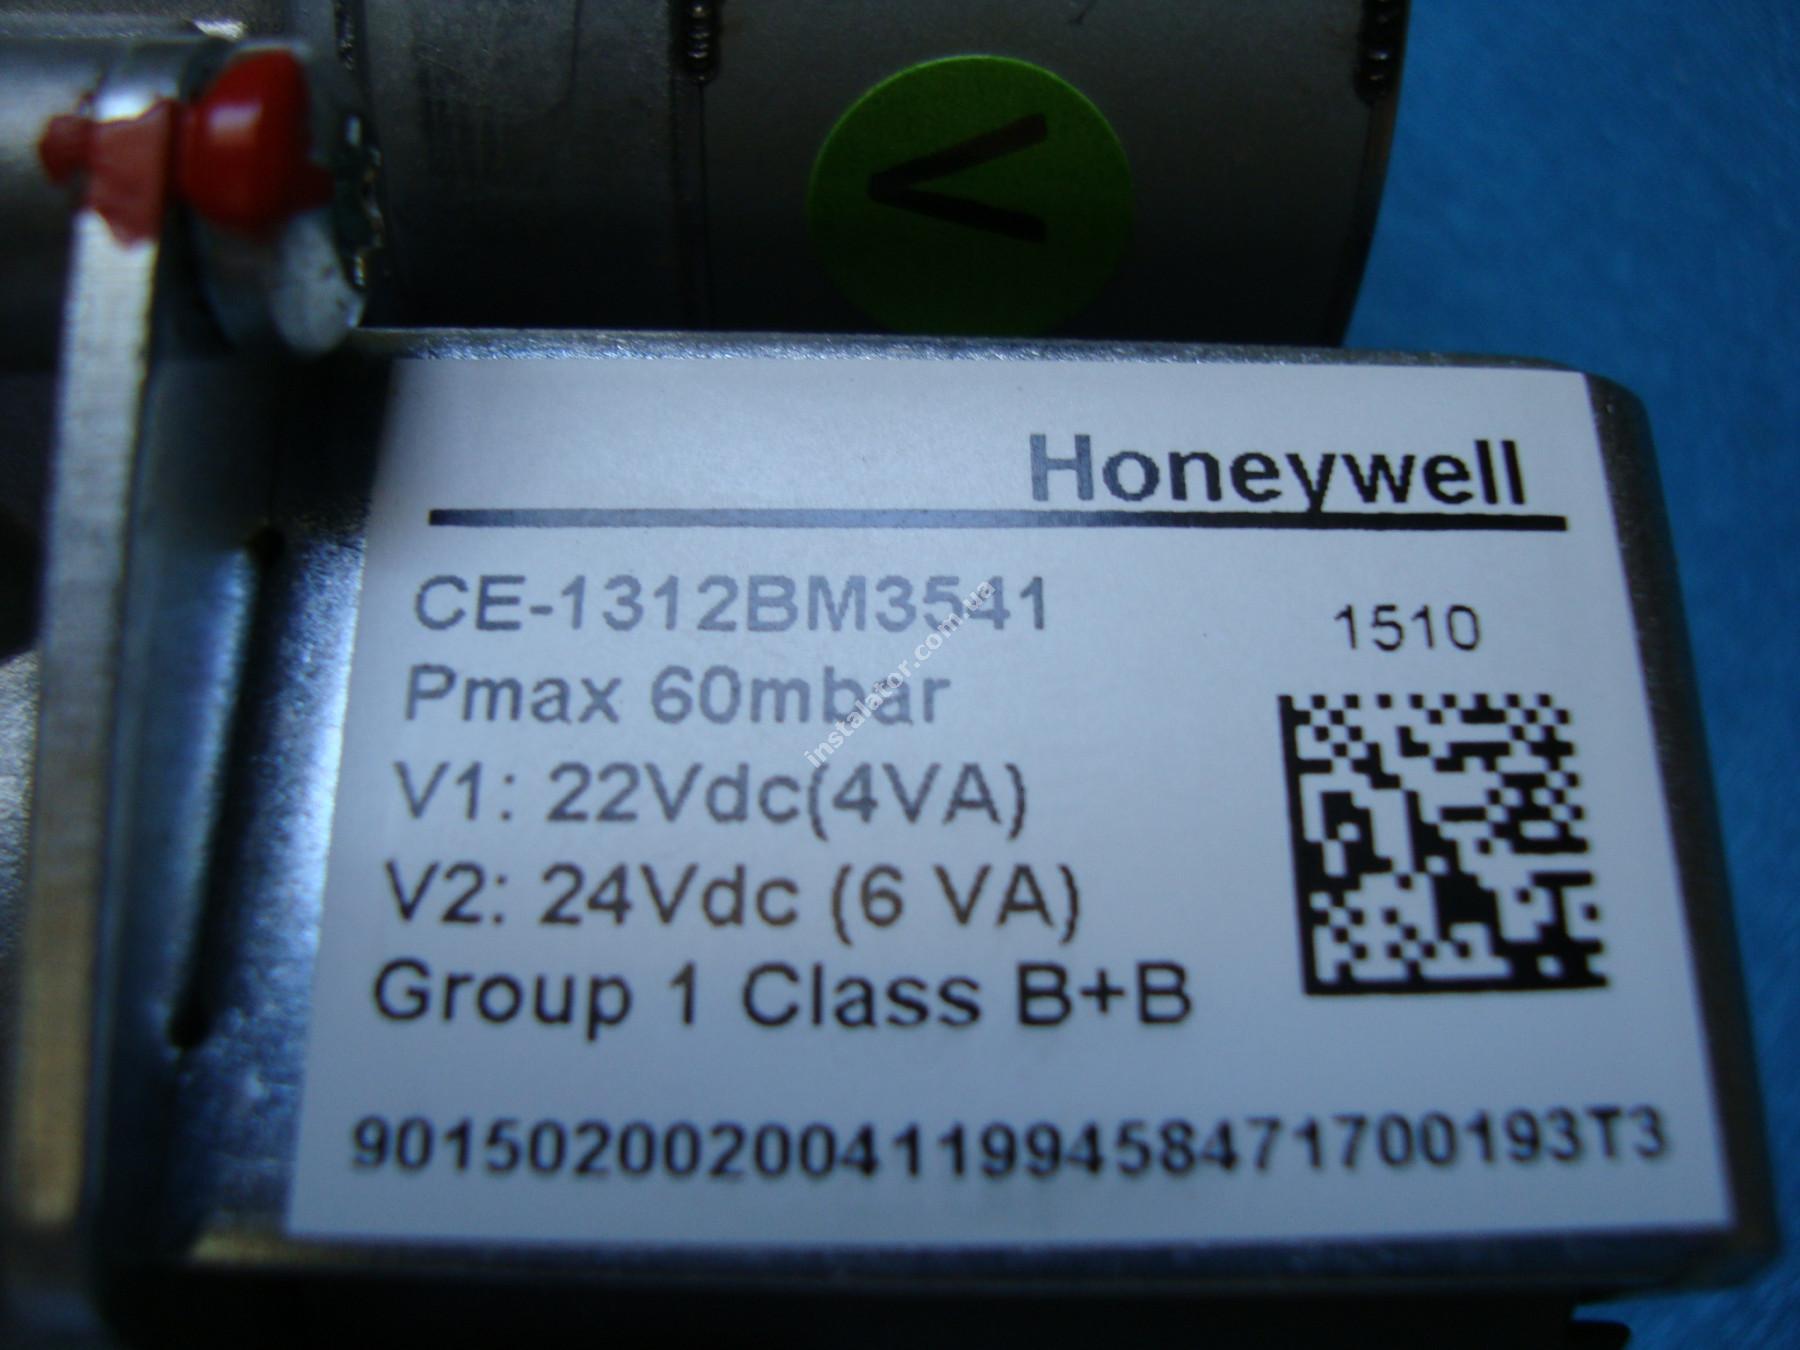 053520 Газовий клапан колонки VAILLANT MAG 16-0/0 XEA G20 (HONEYWELL CE-1312BM354) full-image-0